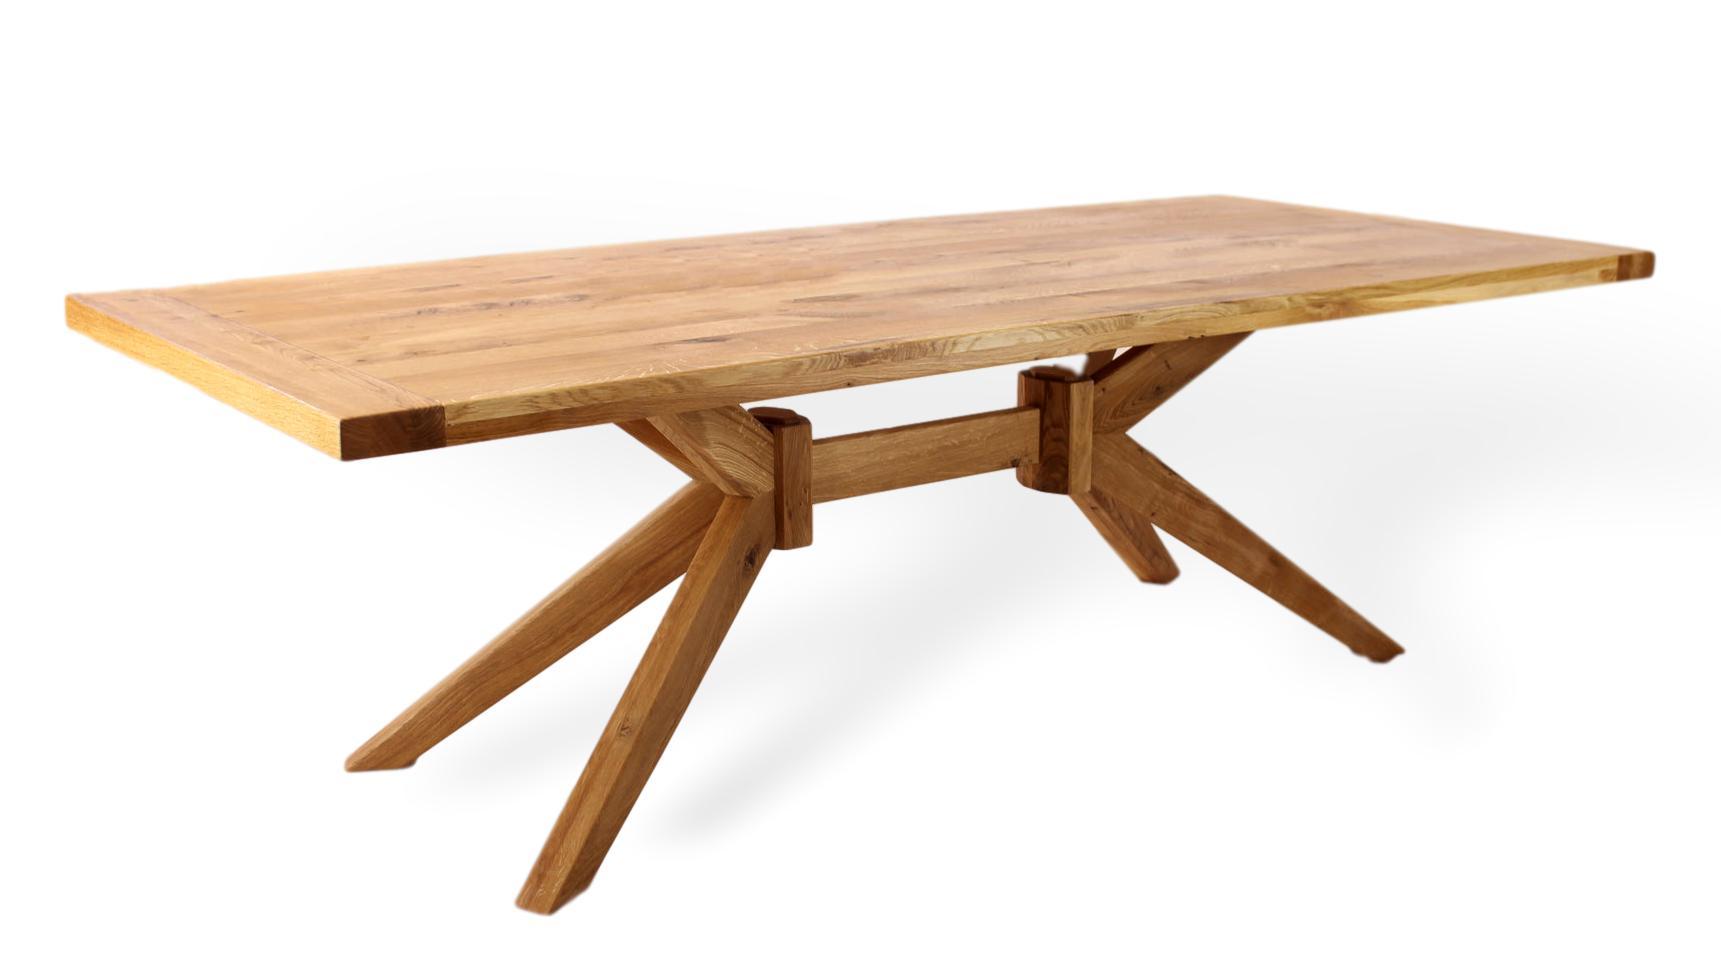 LIAL   Besonderer, preisgekrönter Designertisch aus Massivholz